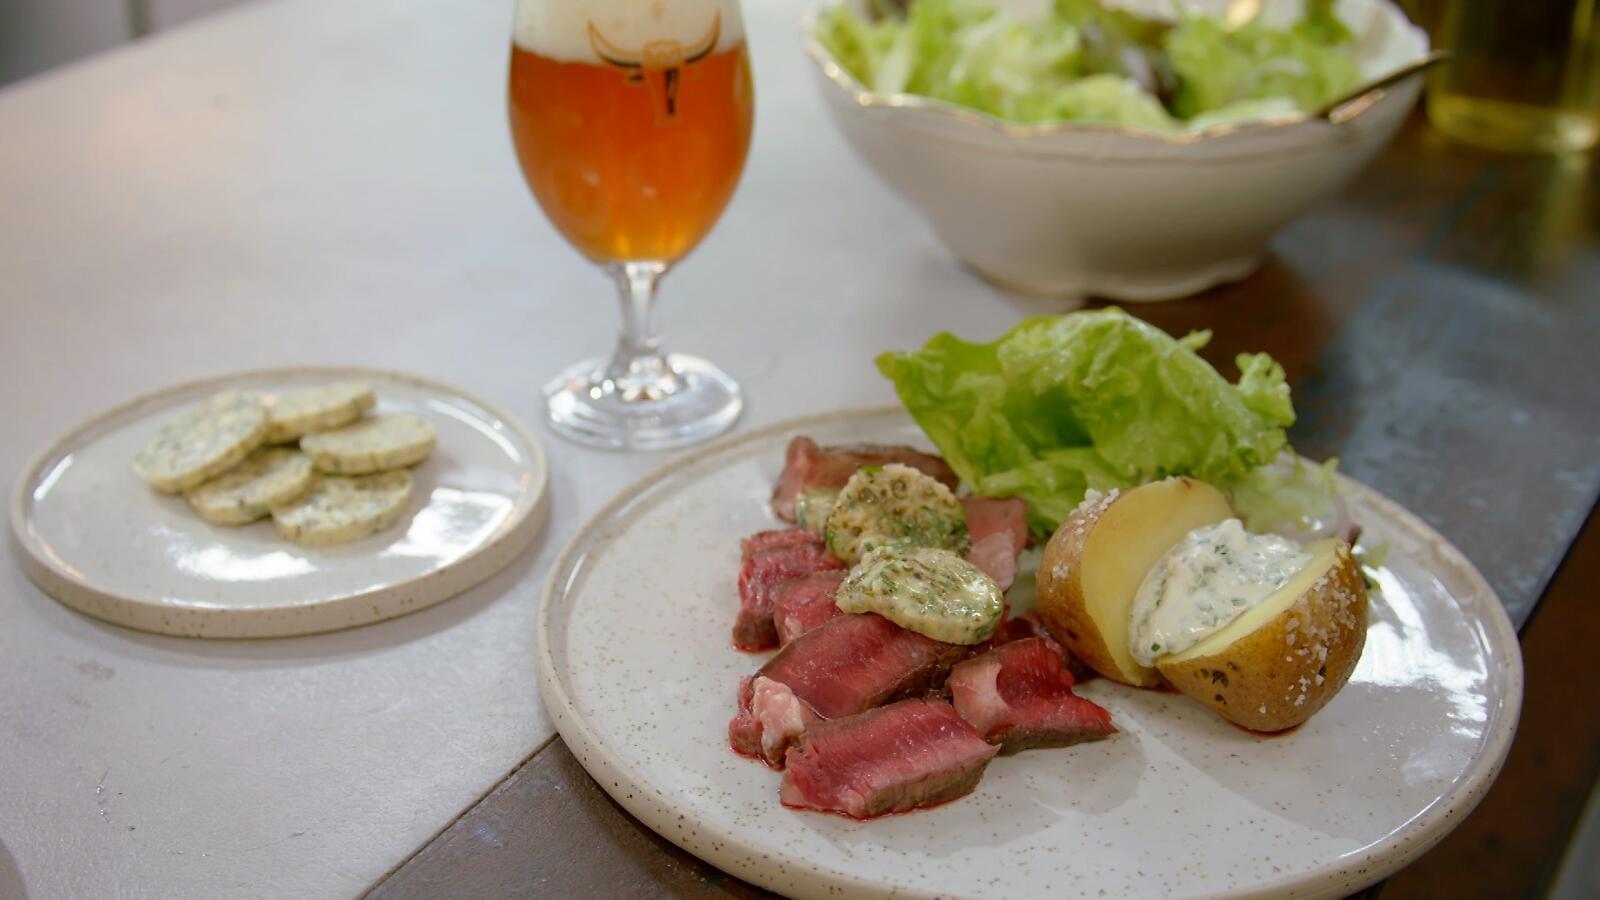 Entrecote met peperboter, gepofte aardappel en groene salade